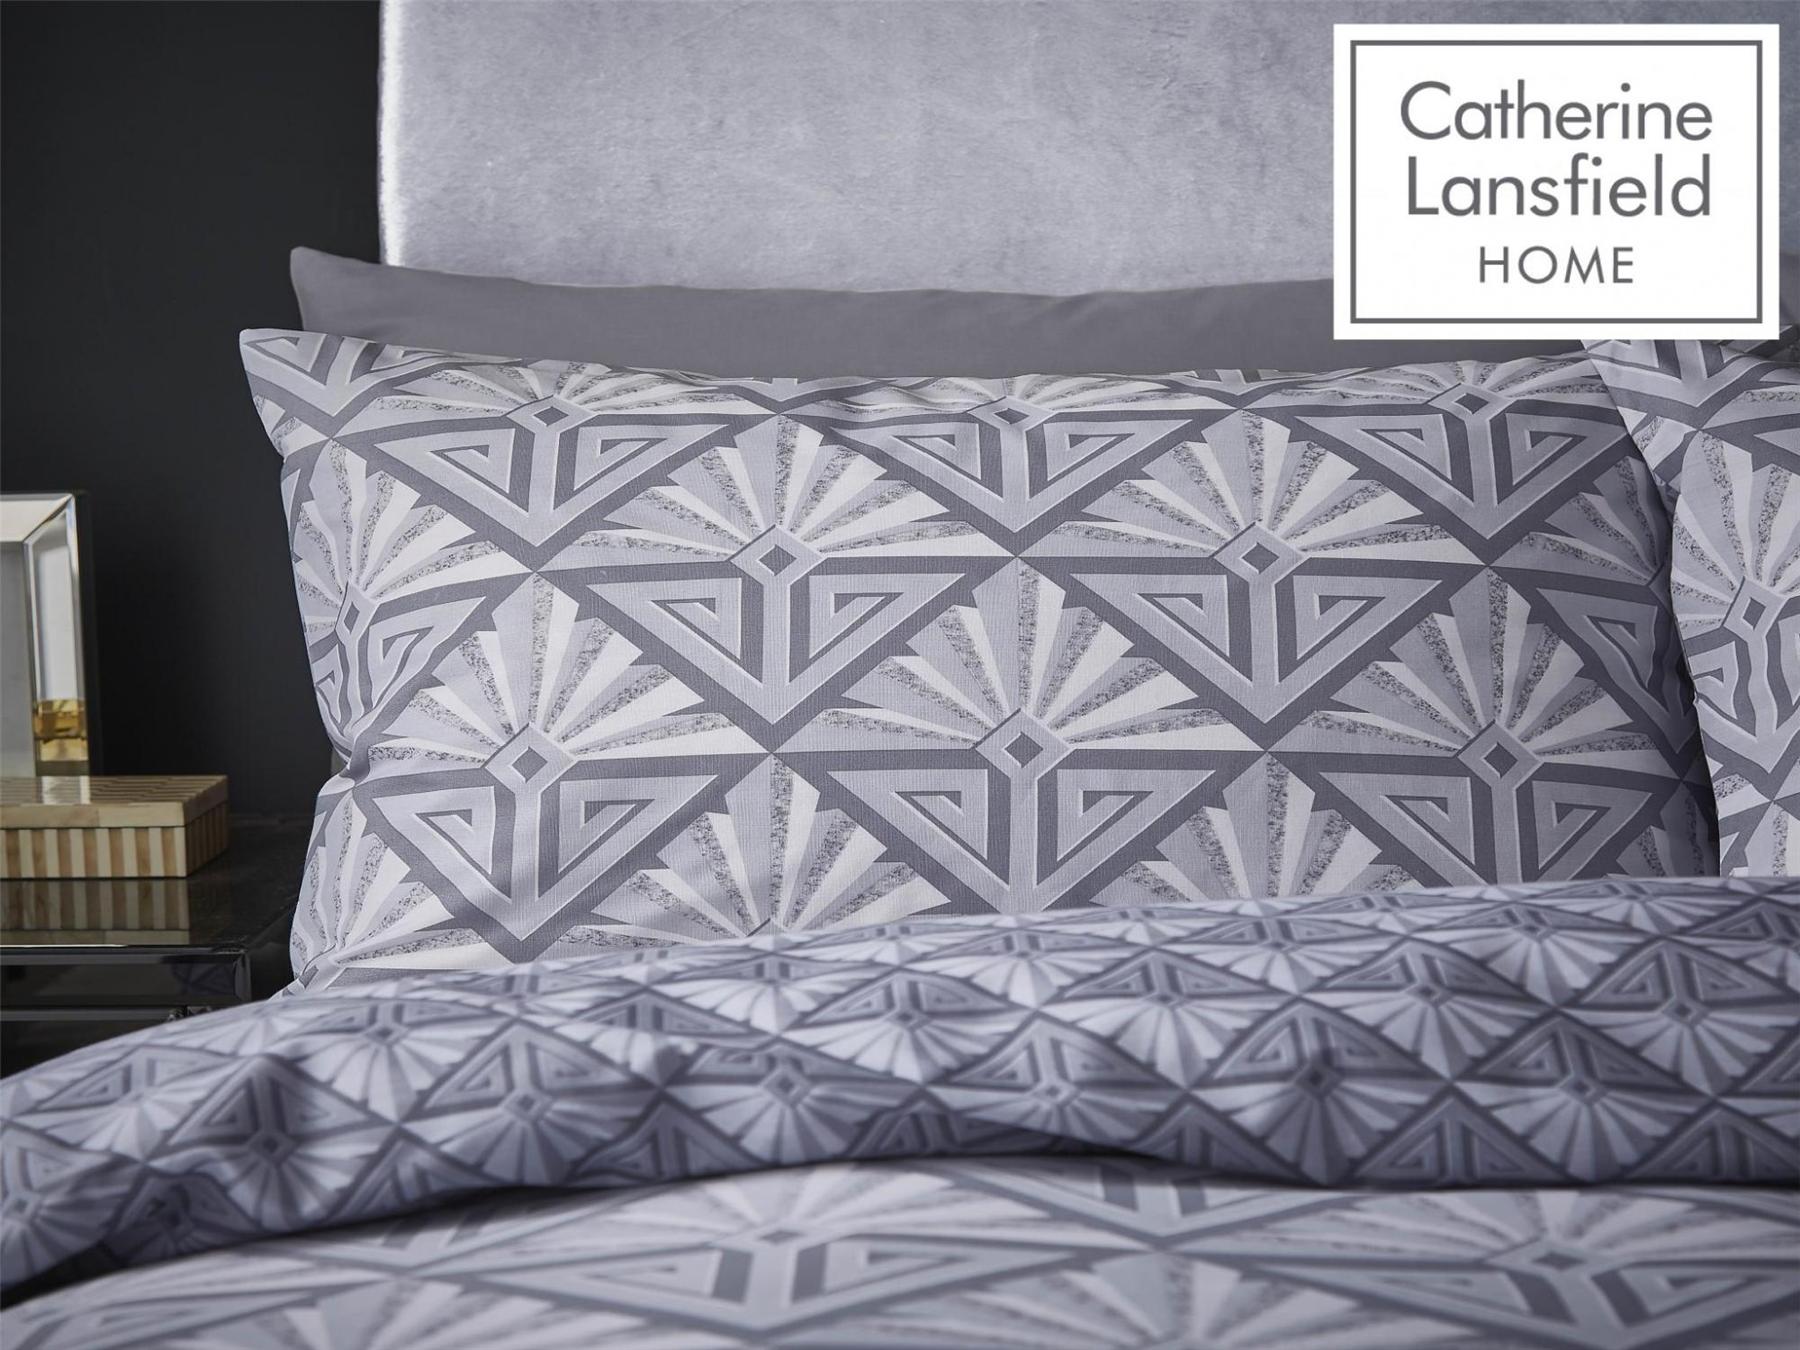 Catherine-Lansfield-Duvet-Set-Reversible-Art-Deco-Grey-Bedding-Pillows-Curtains thumbnail 6